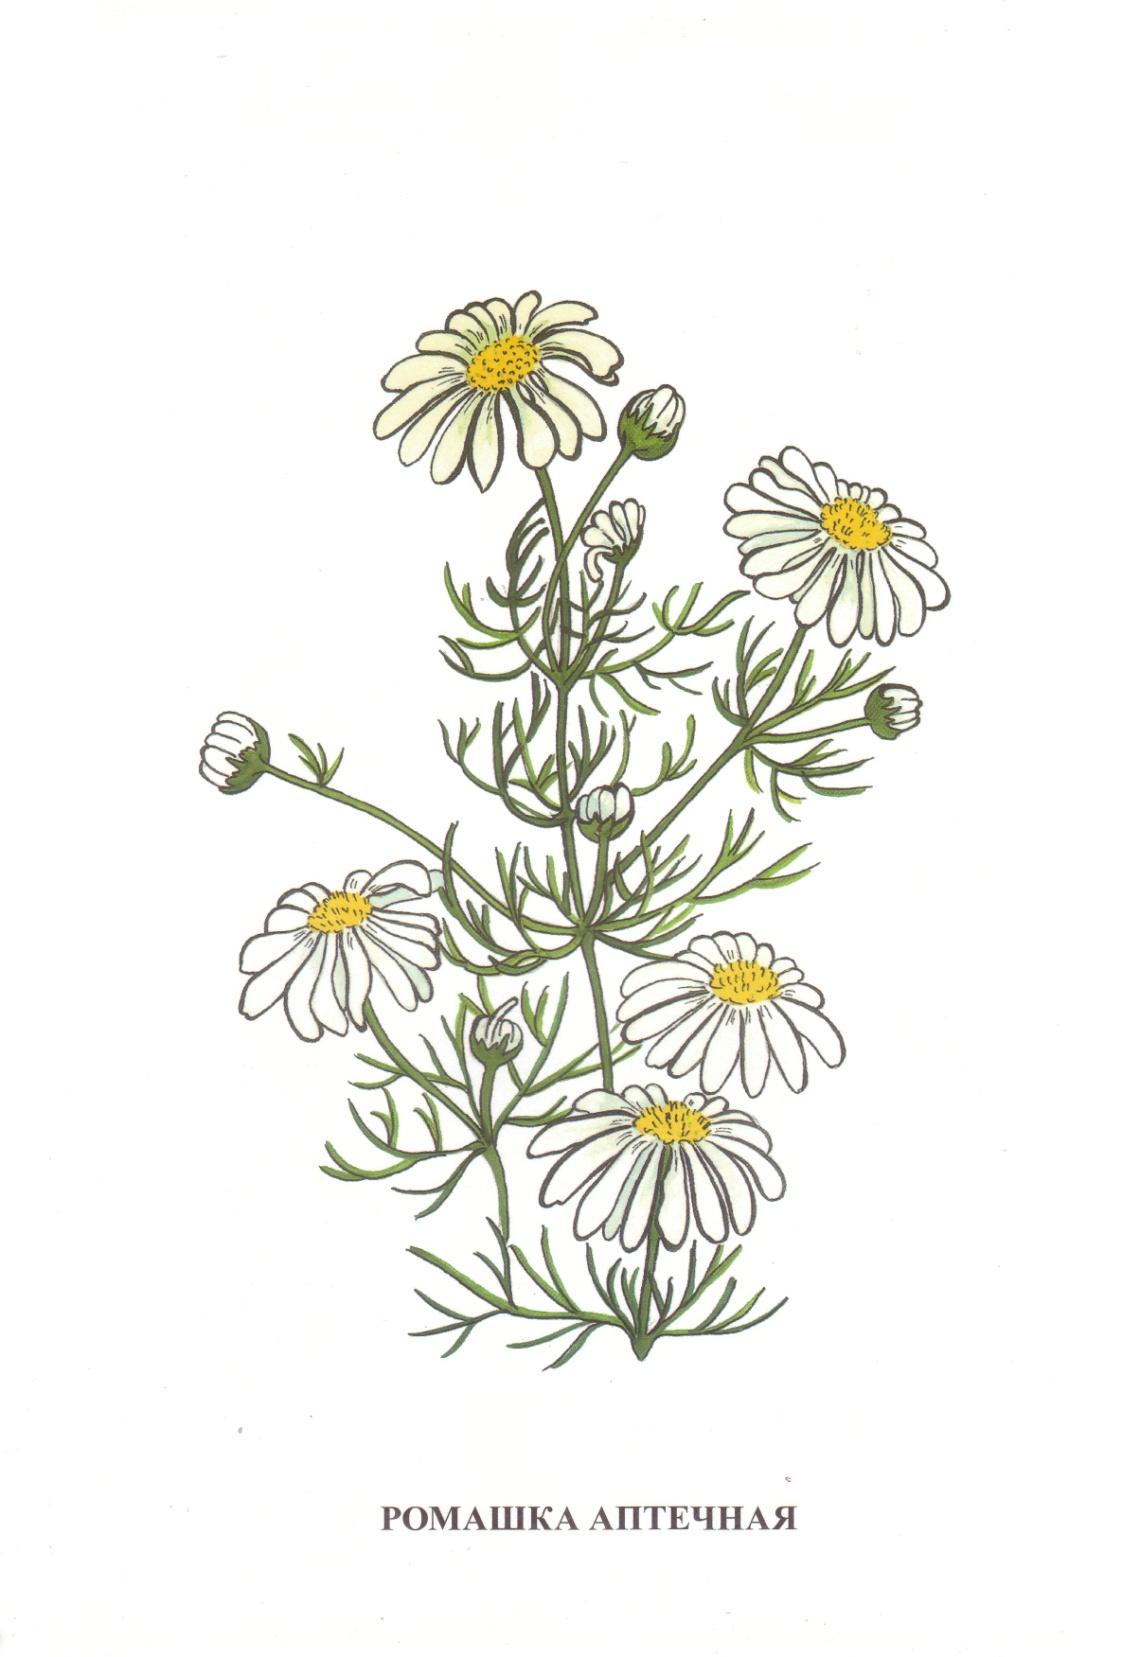 D:\школа 8 вида\Дидакт. материал картинки\Vohrinceva_полевые цветы\Vohrinceva_полевые цветы\1-15.jpg